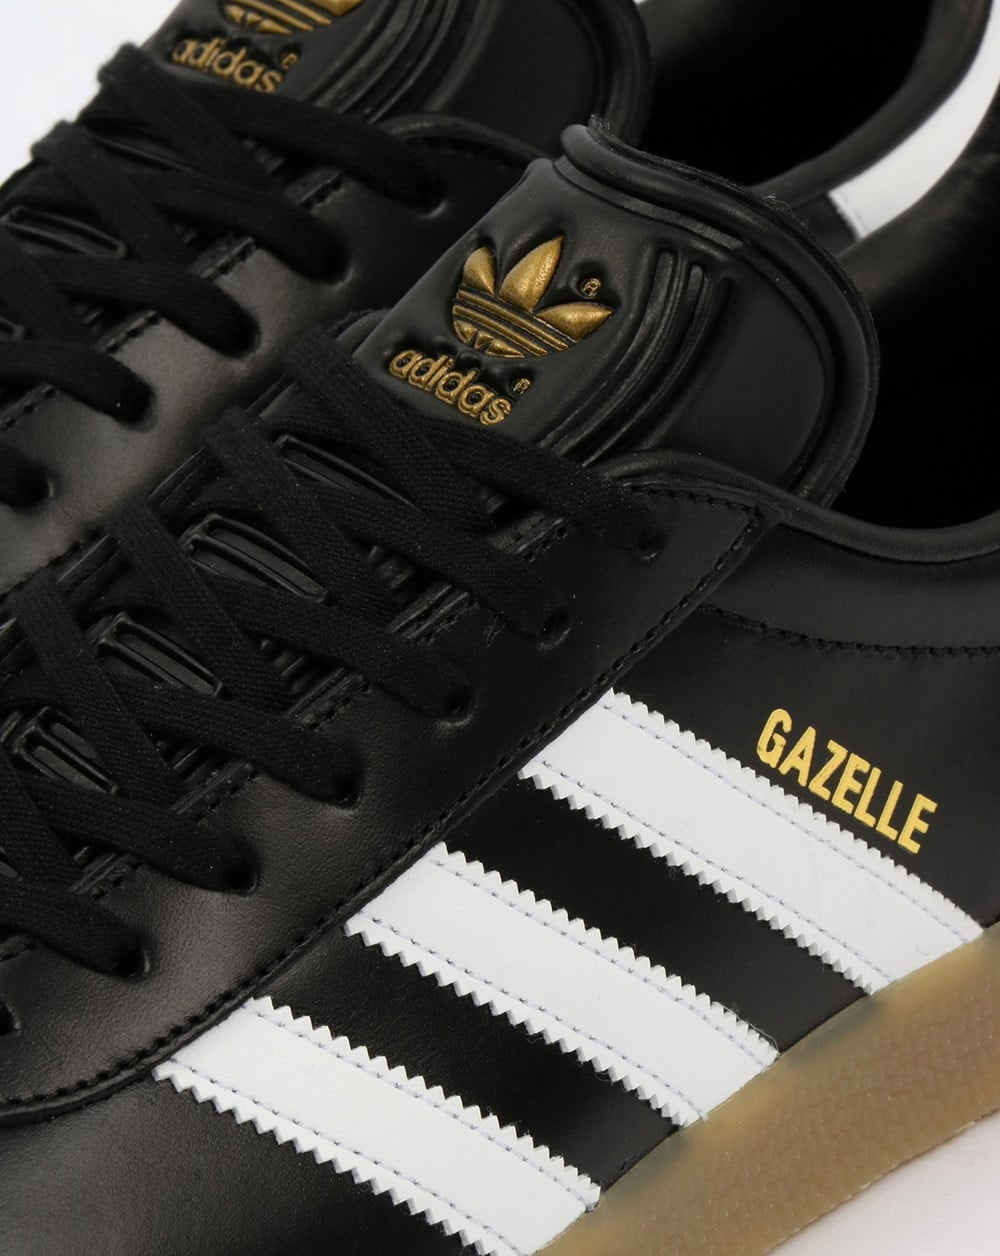 Adidas Gazelle Trainers Black/White/Gum